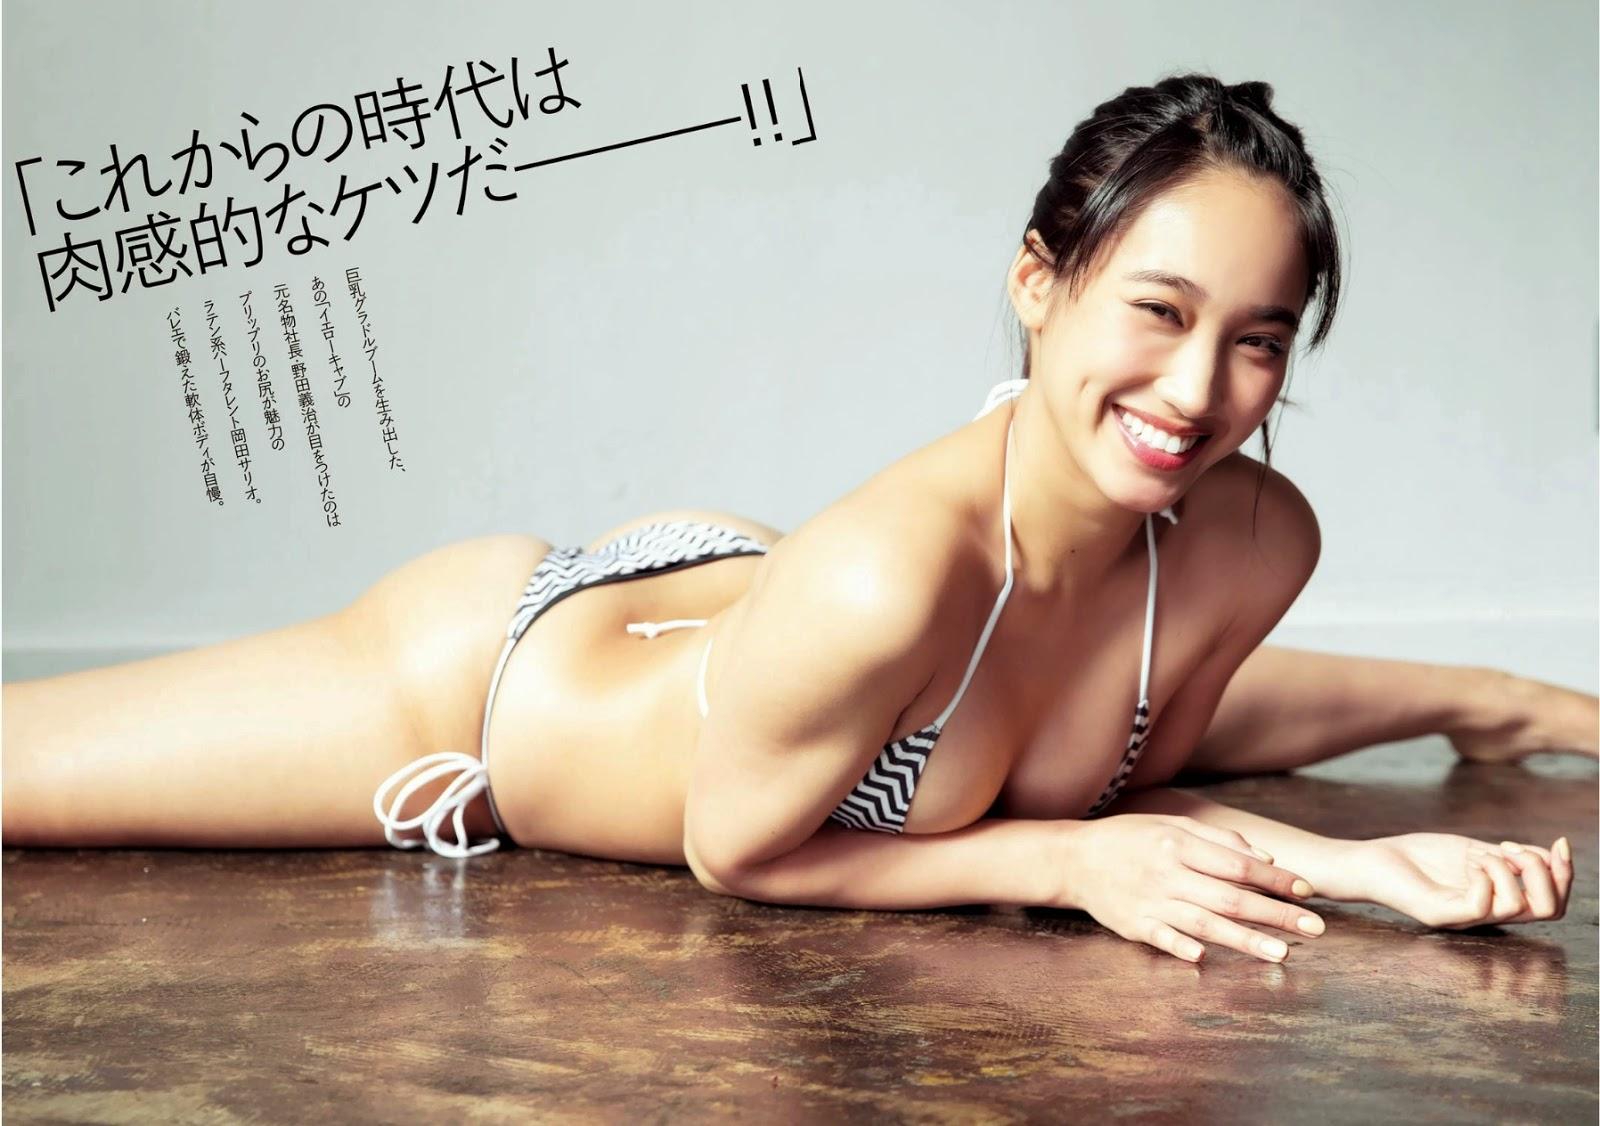 Okada Salio 岡田サリオ We love your SEXY ASS wallpaper HD